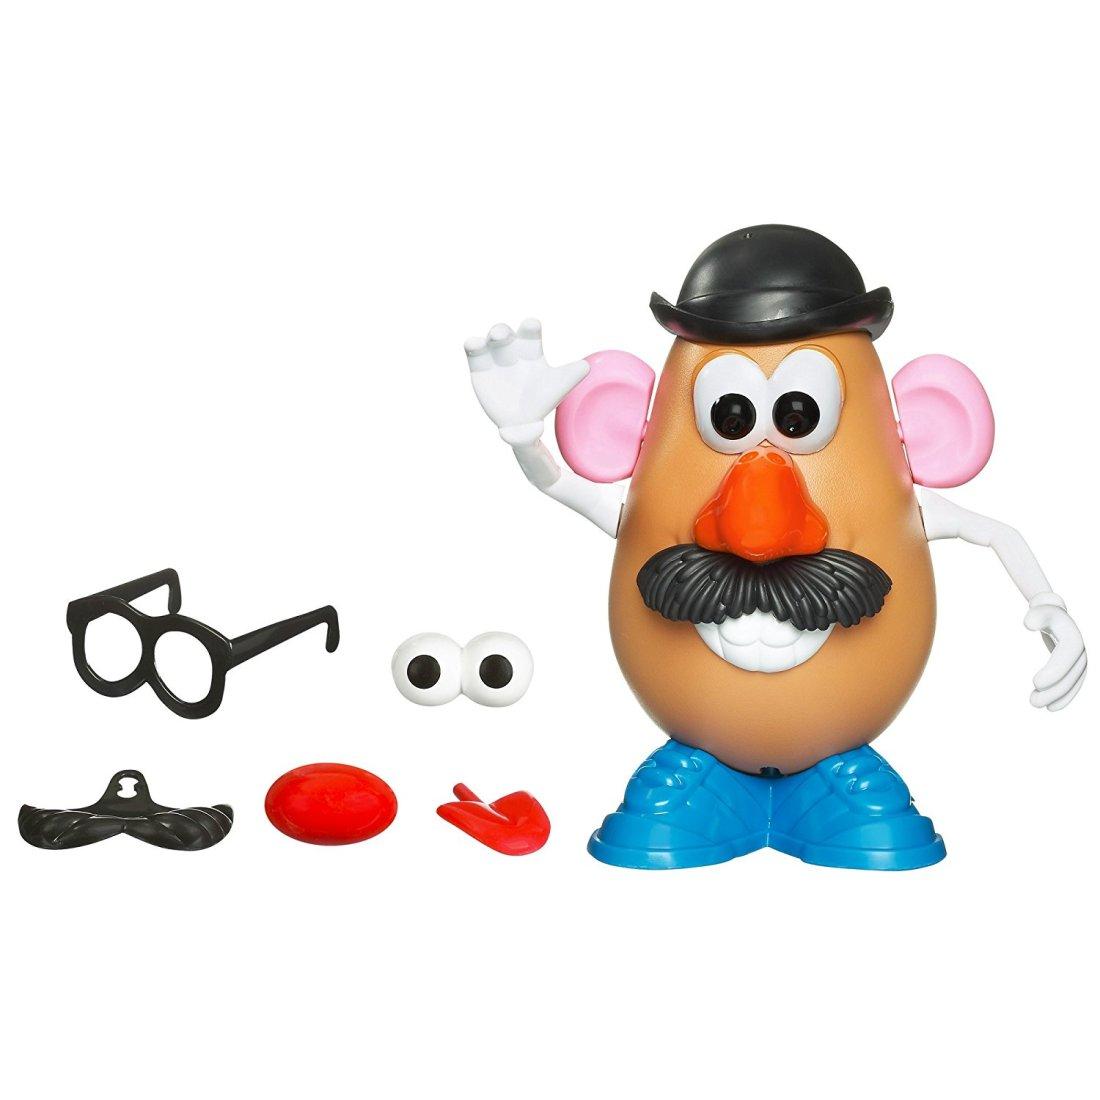 Mr Potato Head Toy Story 3 Classic Mr Potato Head Figure